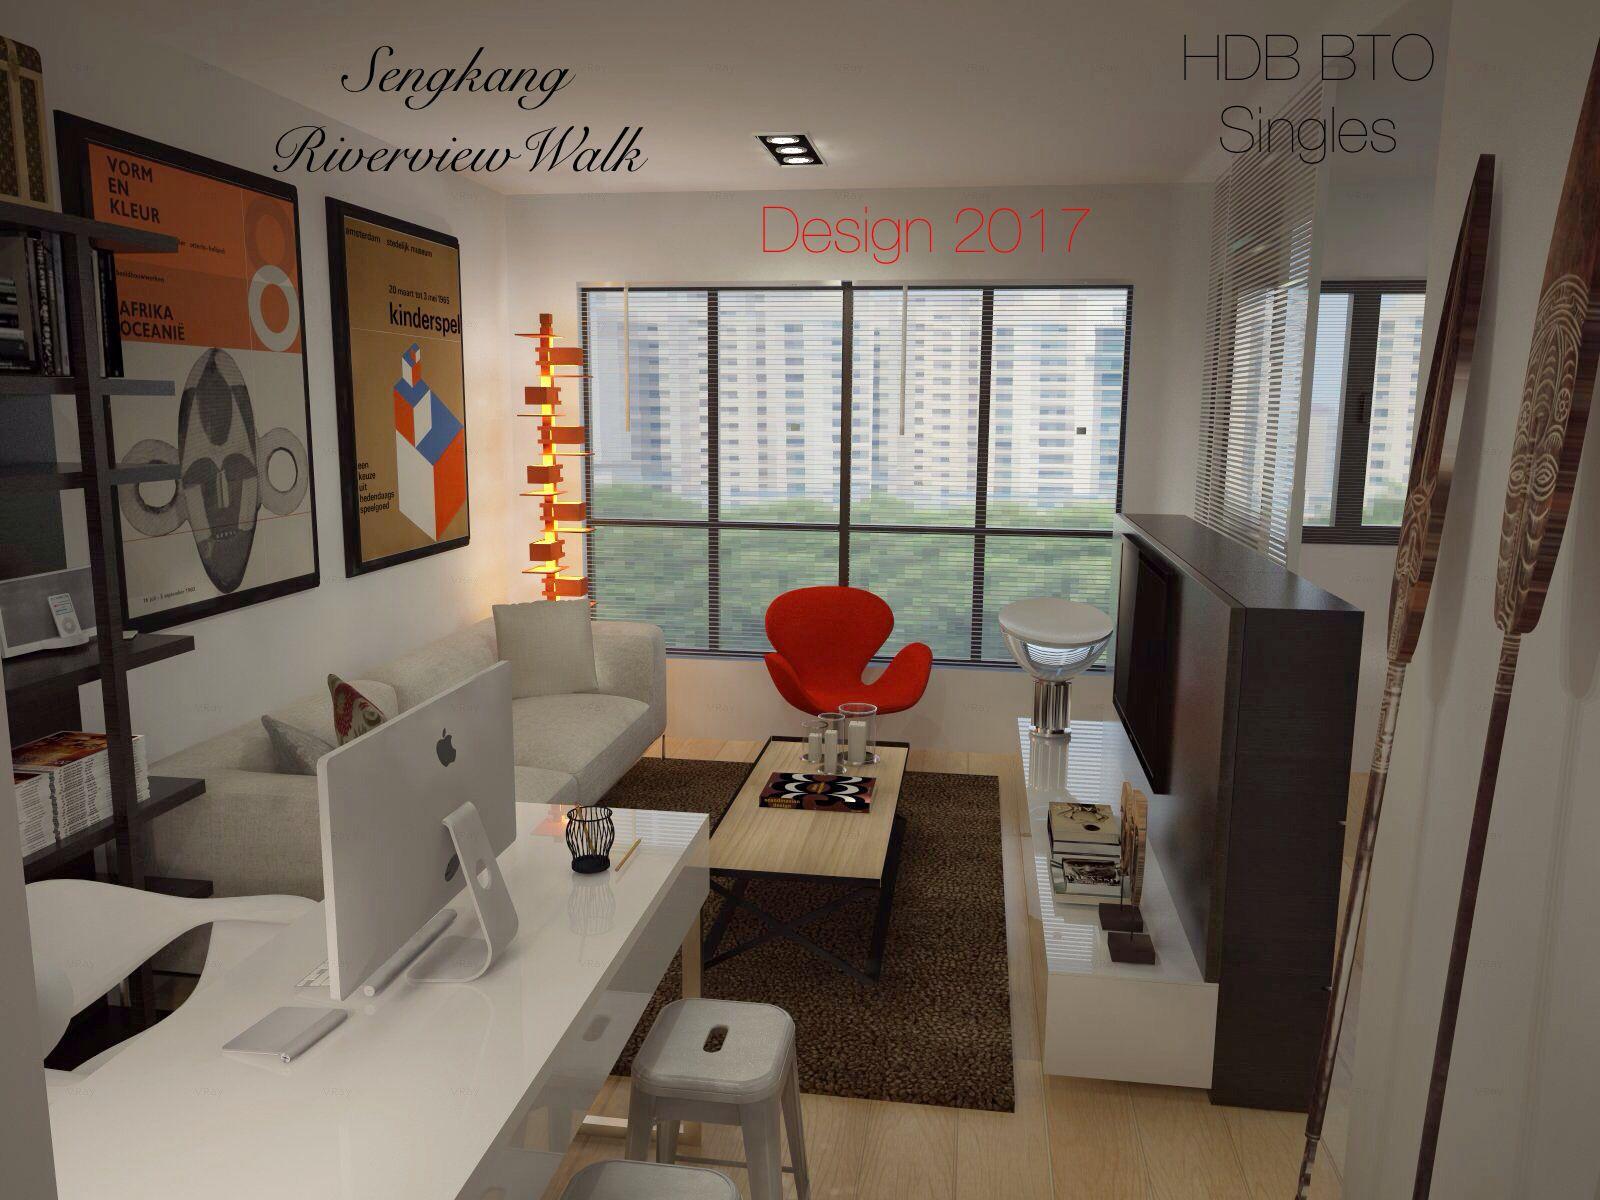 Sengkang riverview walk hdb bto for singles 47sqm 2 room for Hdb bto 5 room interior design